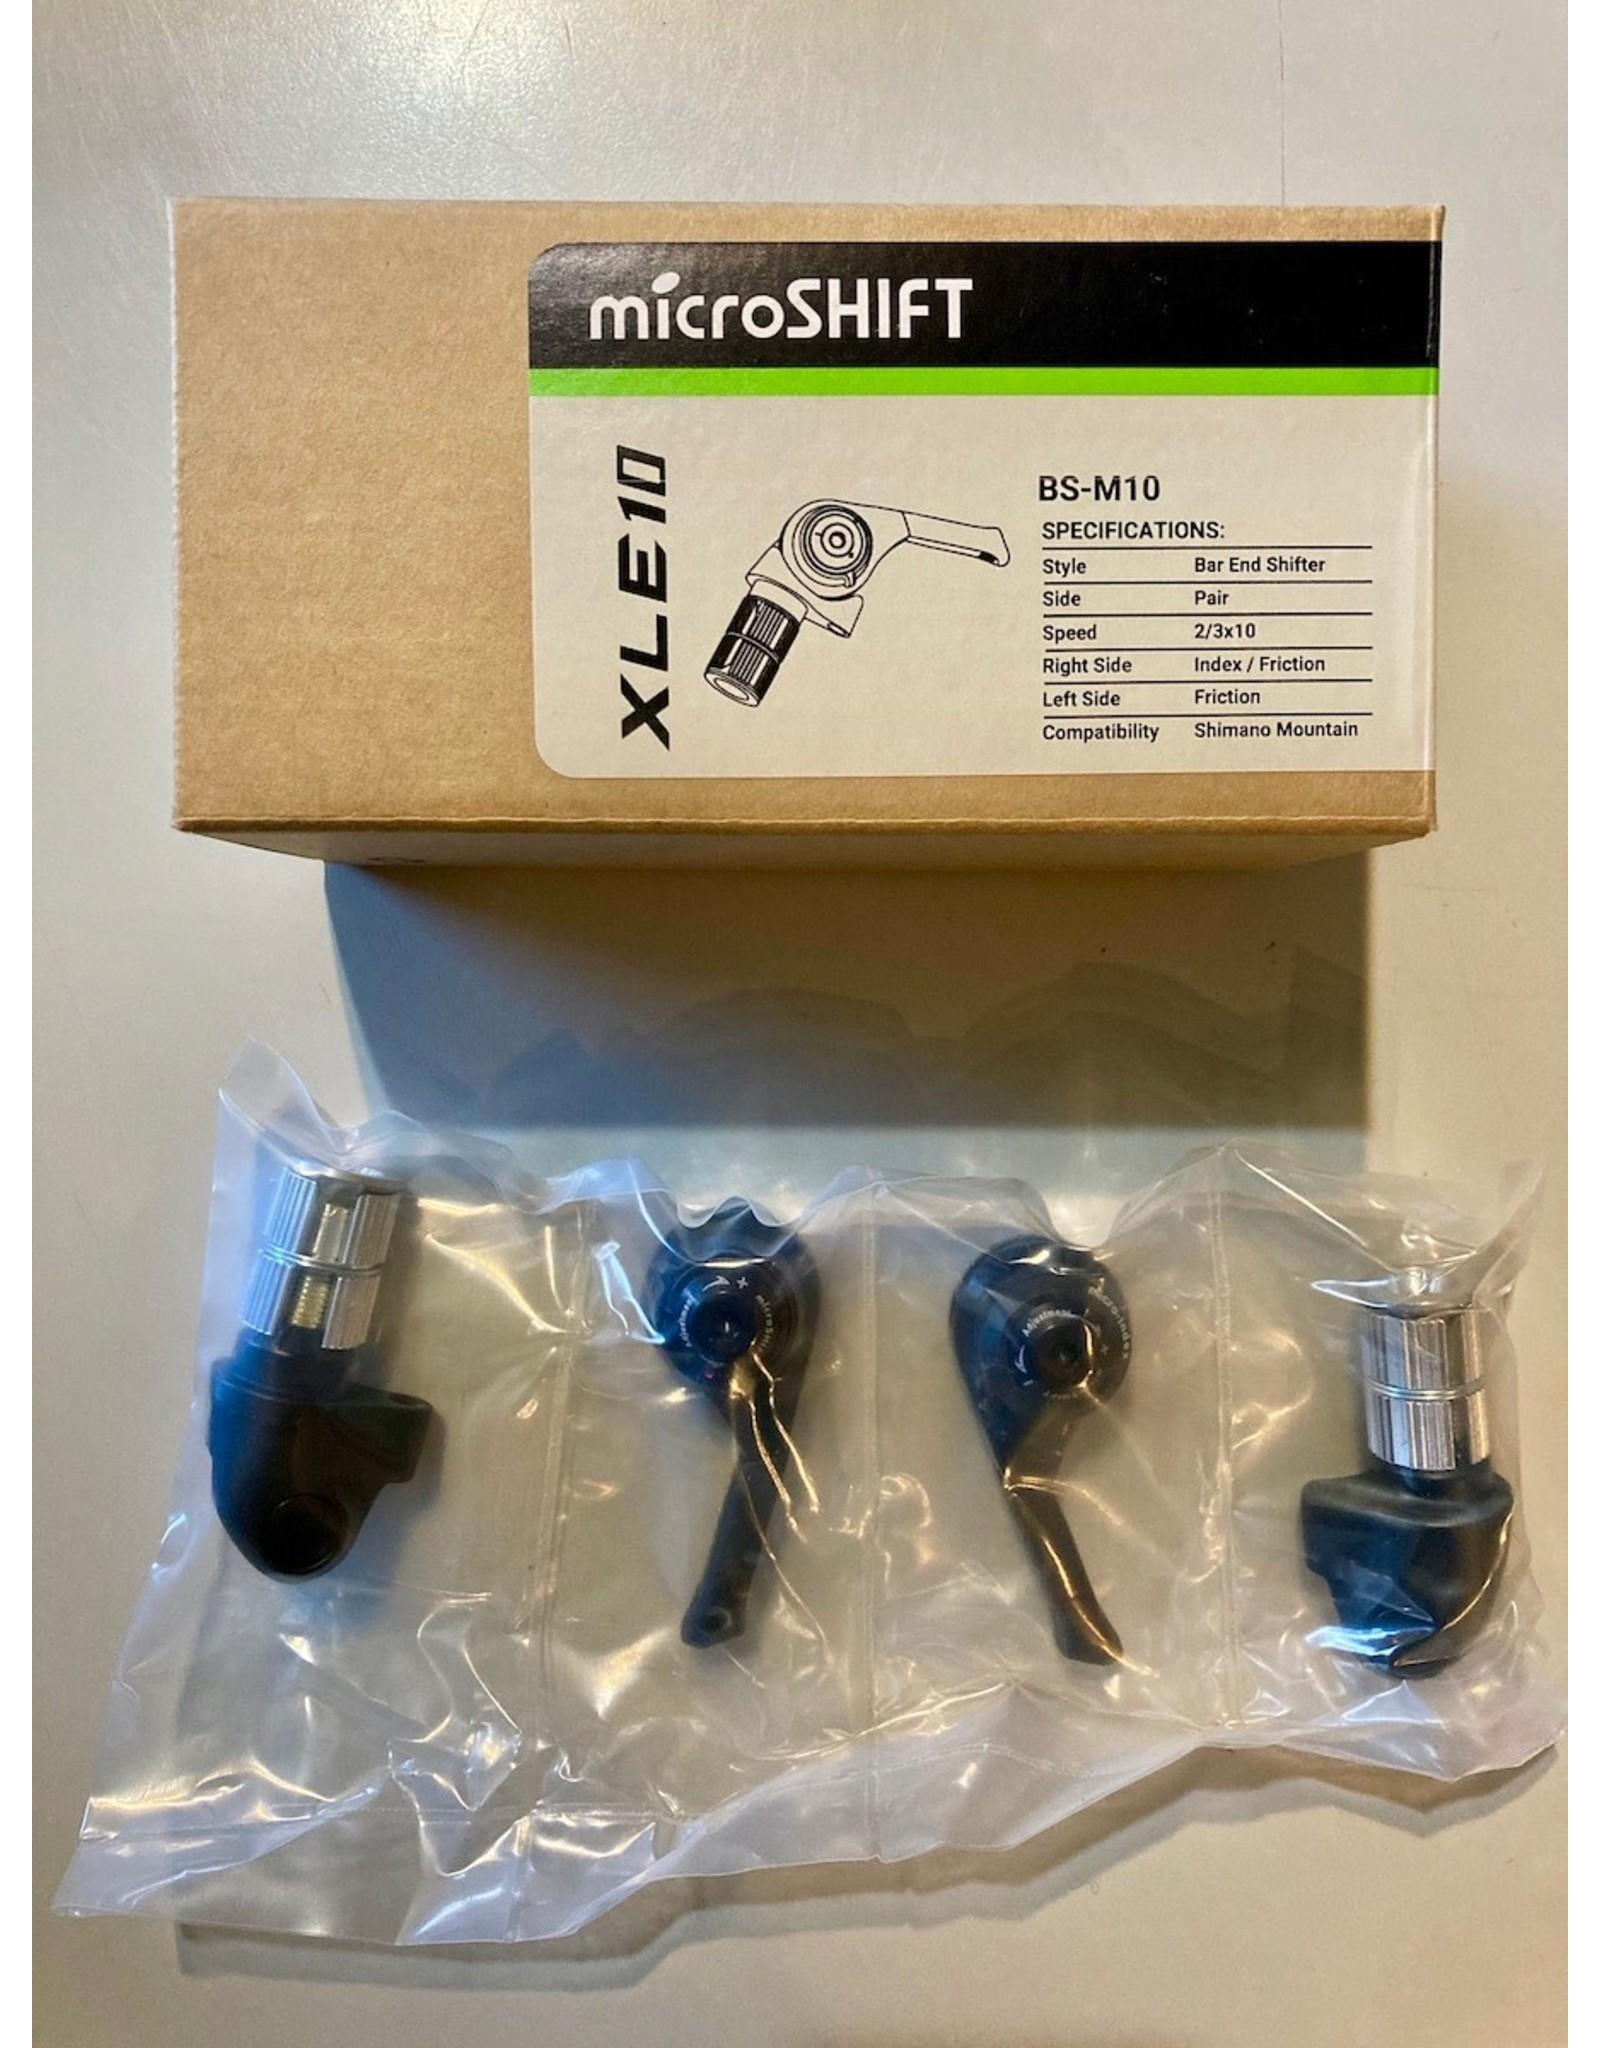 Microshift microSHIFT Bar End Shifter Set, 10-Speed Mountain, Double/Triple, Shimano Compatible, Black